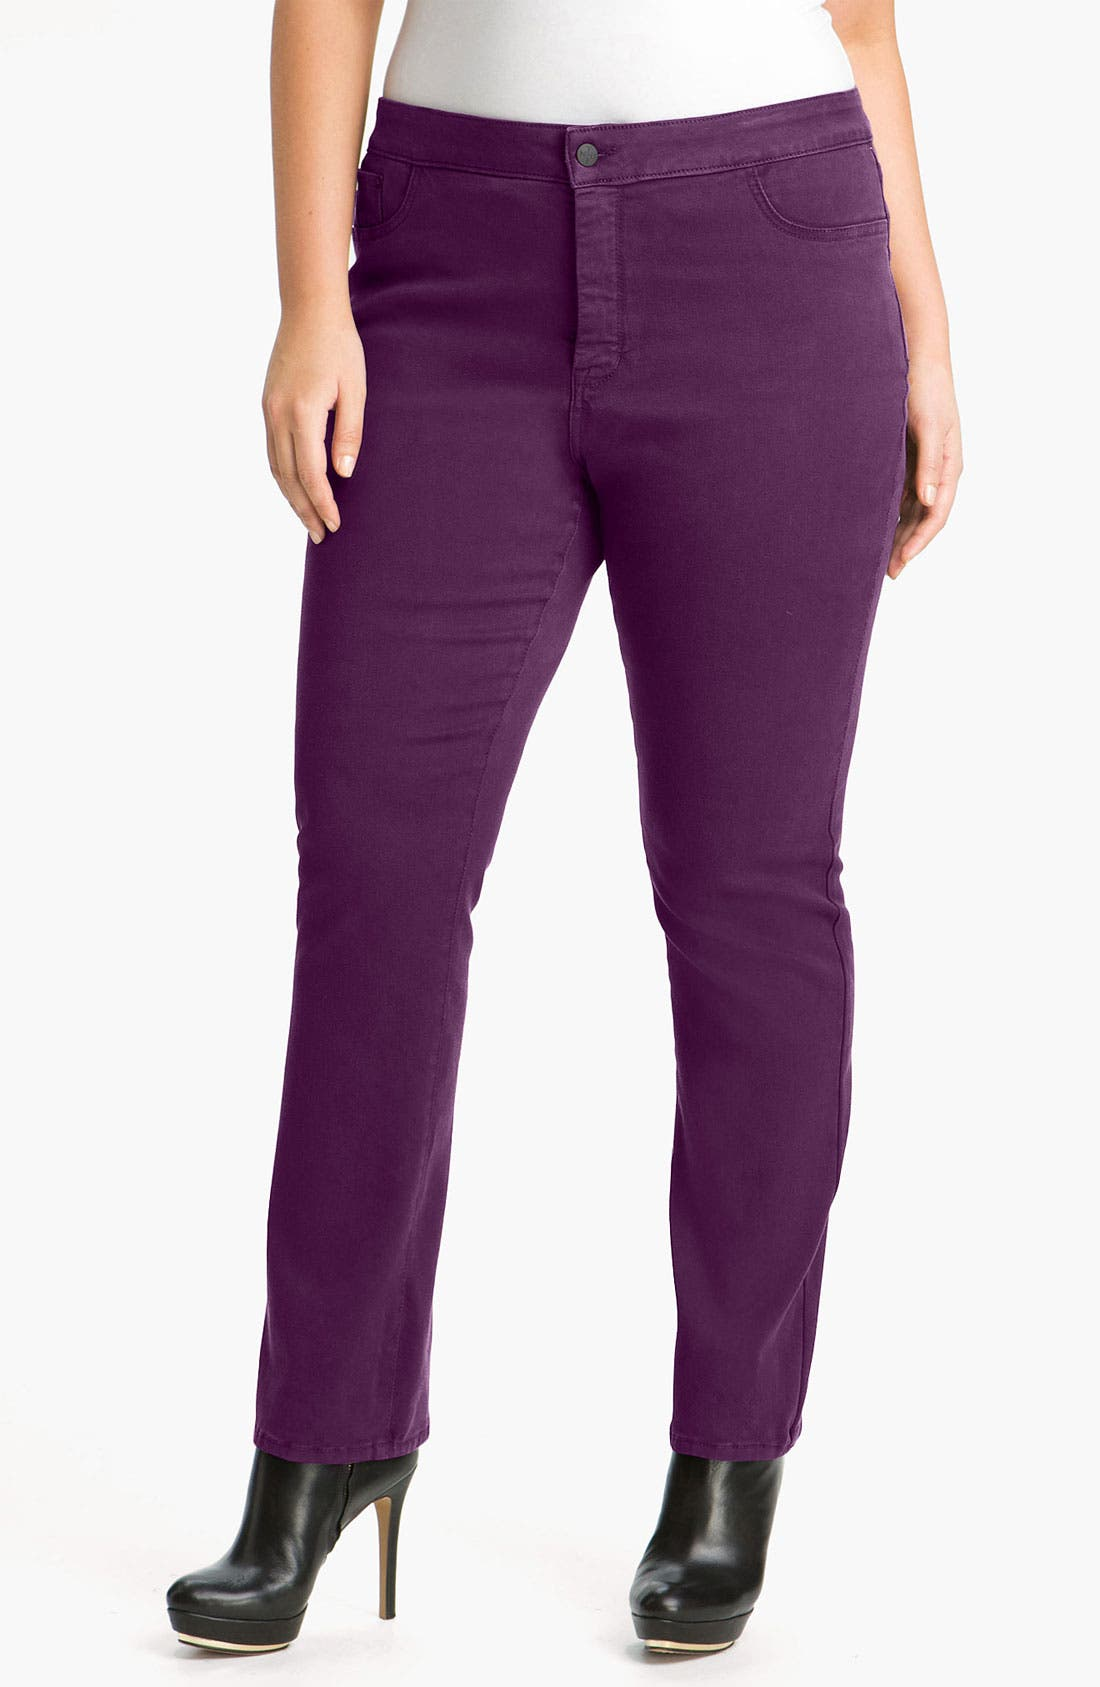 Alternate Image 1 Selected - NYDJ 'Jaclyn' Stretch Skinny Jeans (Plus)